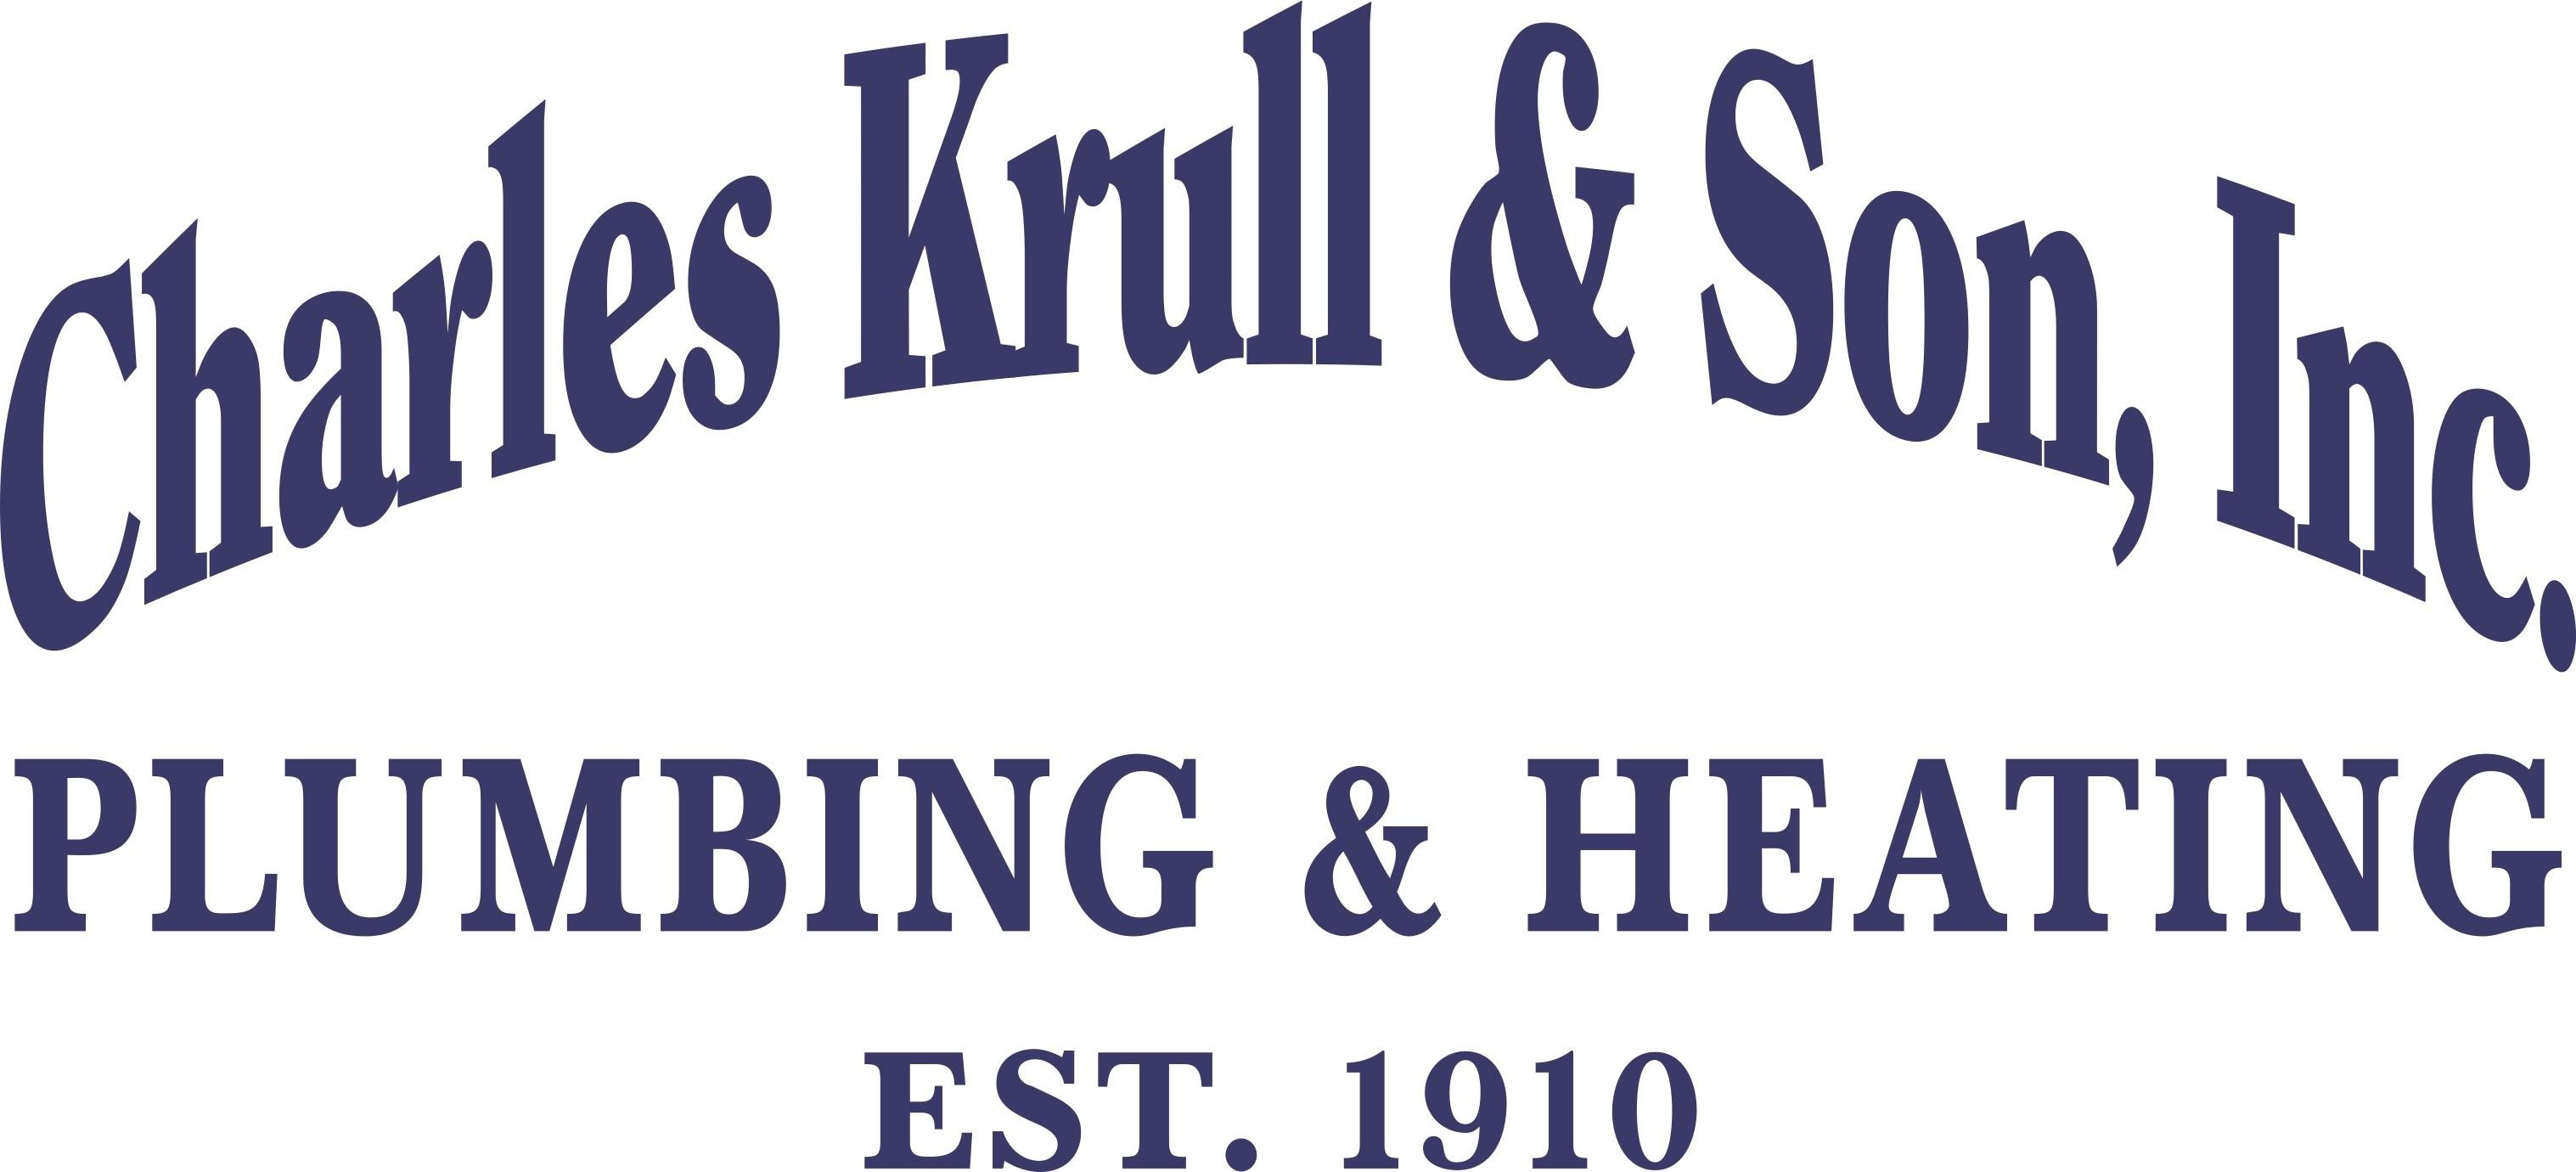 Charles Krull & Son Inc Plumbing & Heating logo